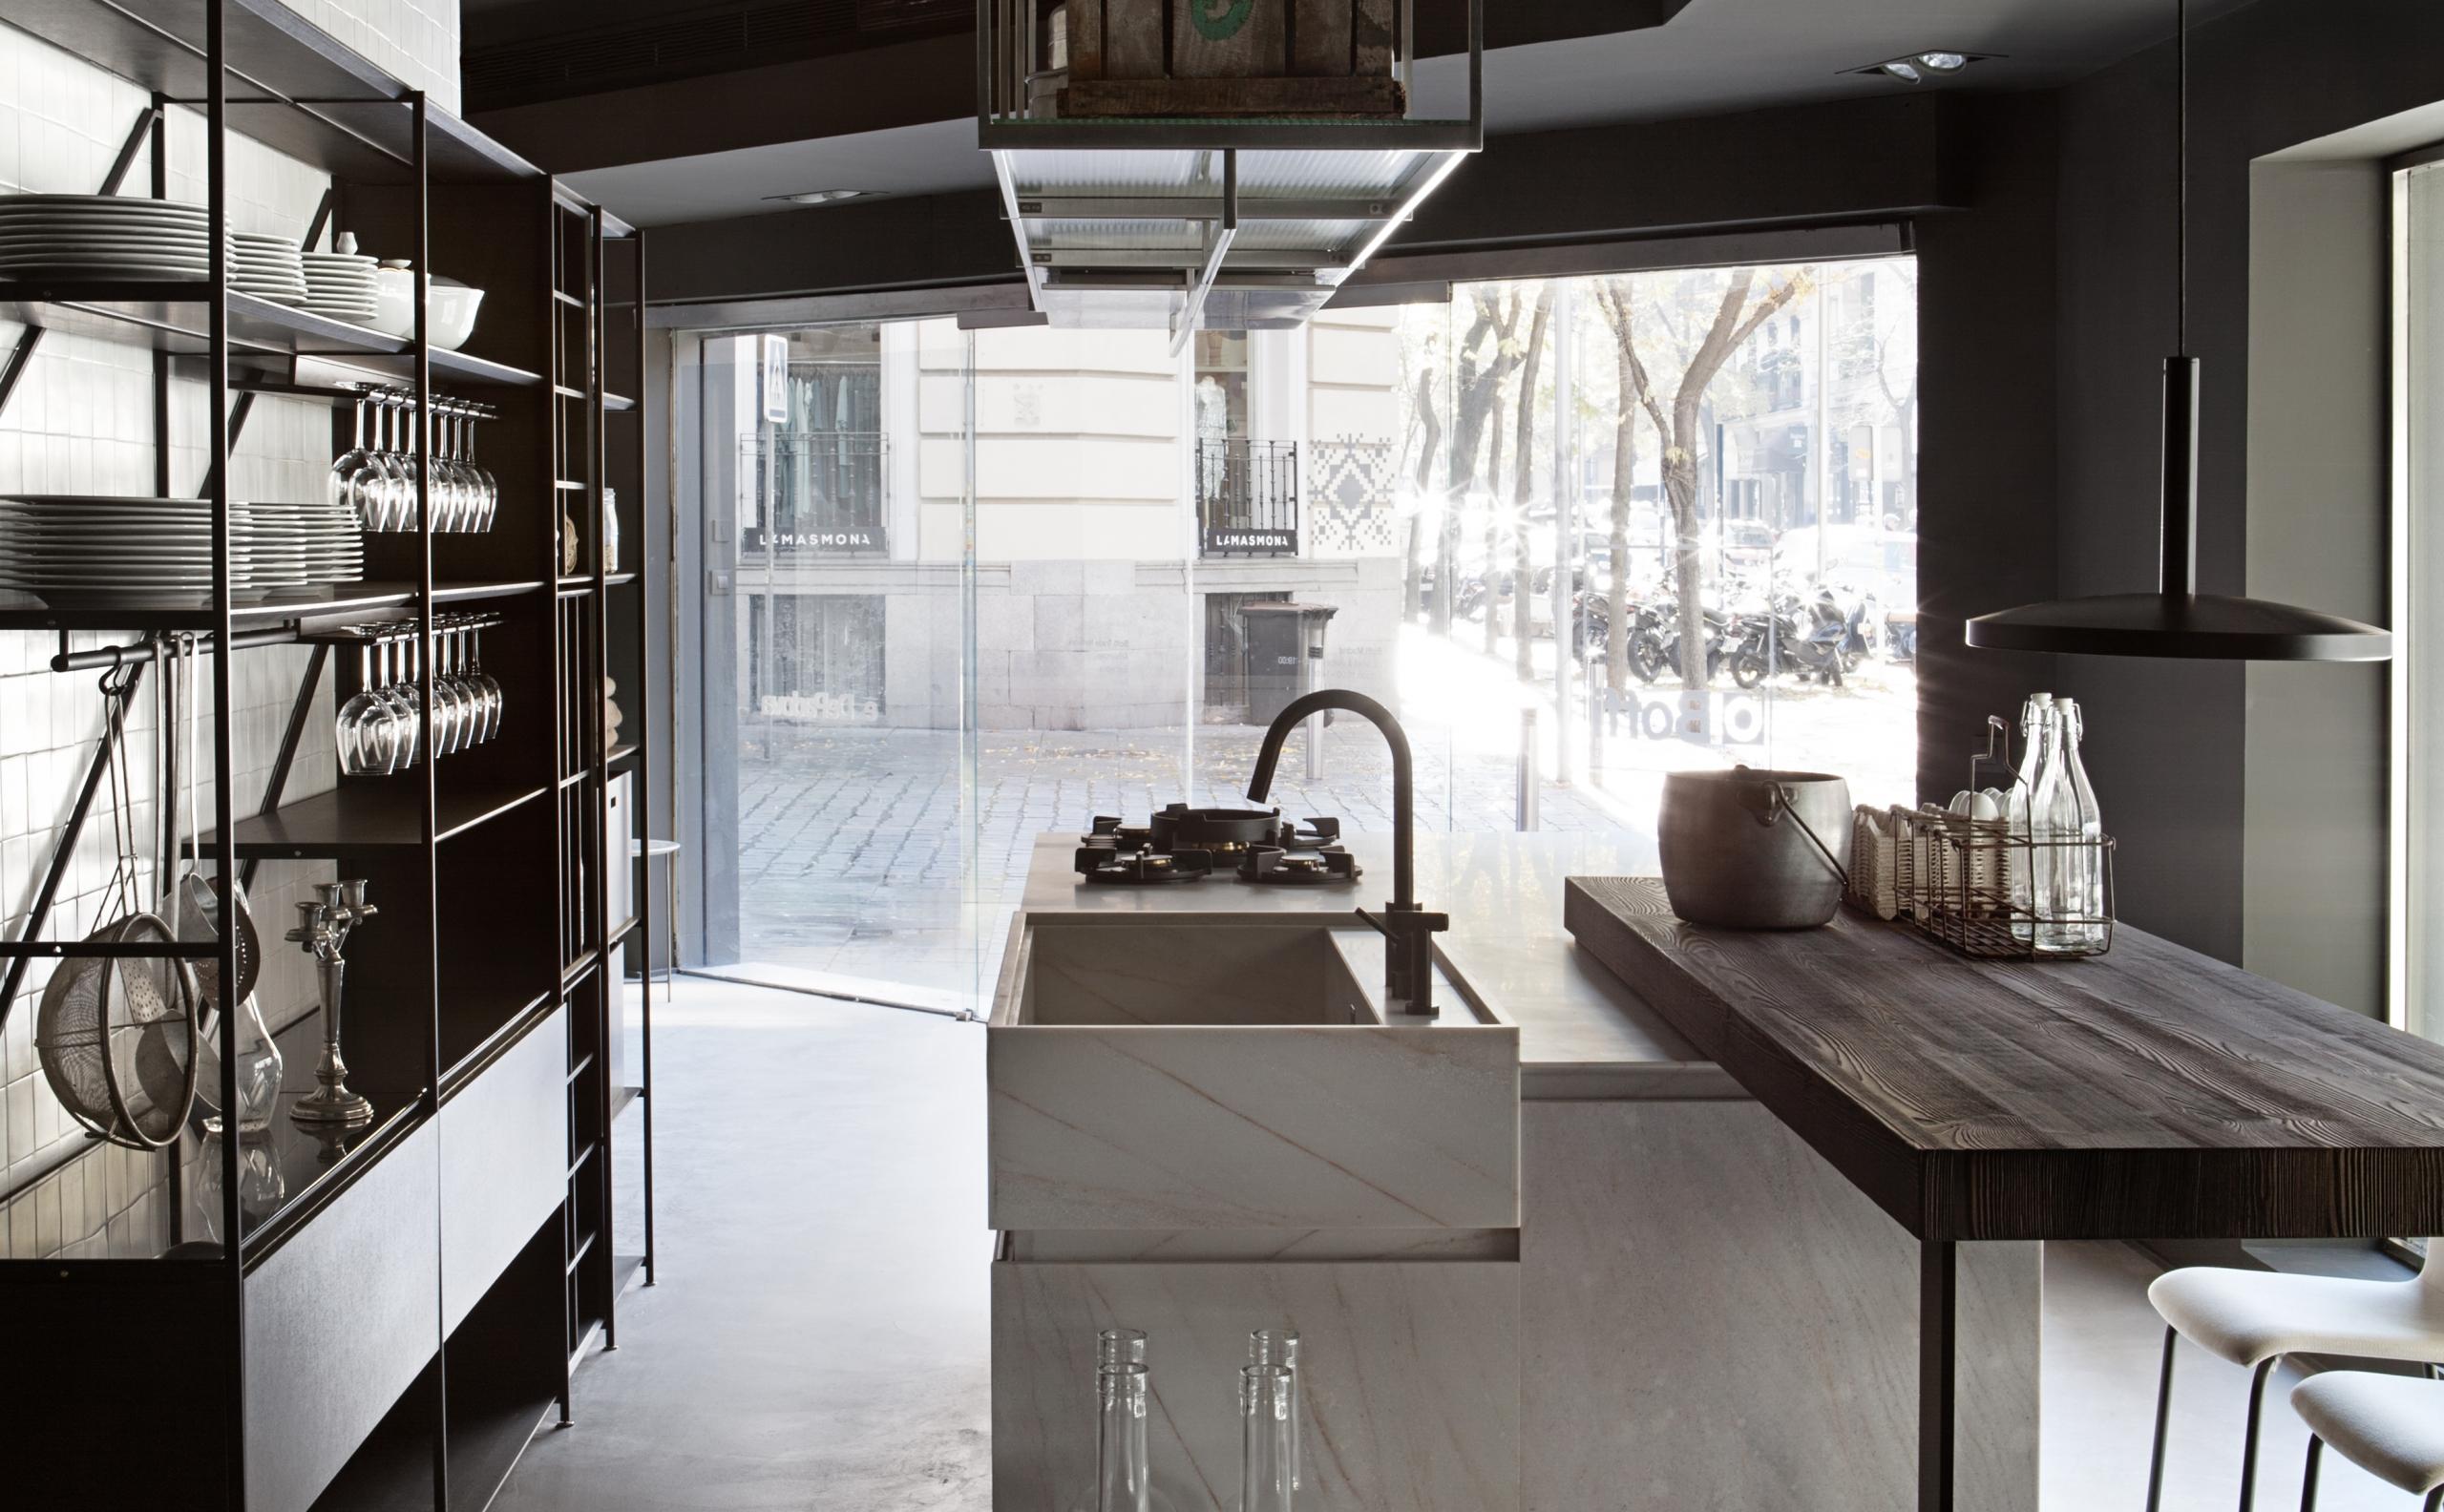 Boffi DePadova News: Boffi | De Padova opens the doors to a new design space in Madrid 2